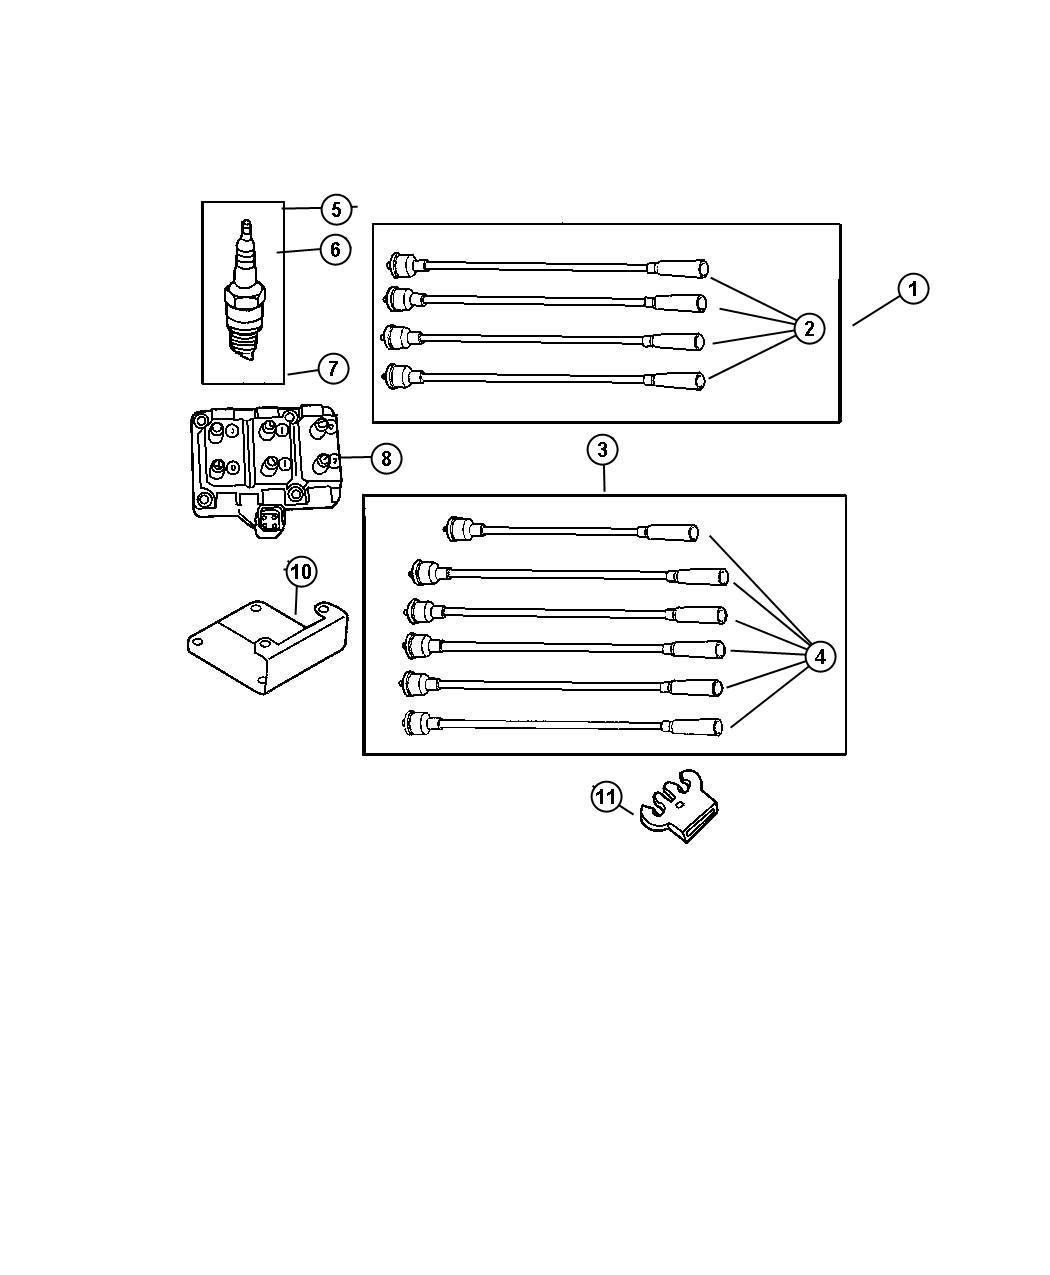 Dodge Caravan Spark plug. Re-14-plp5. Wires